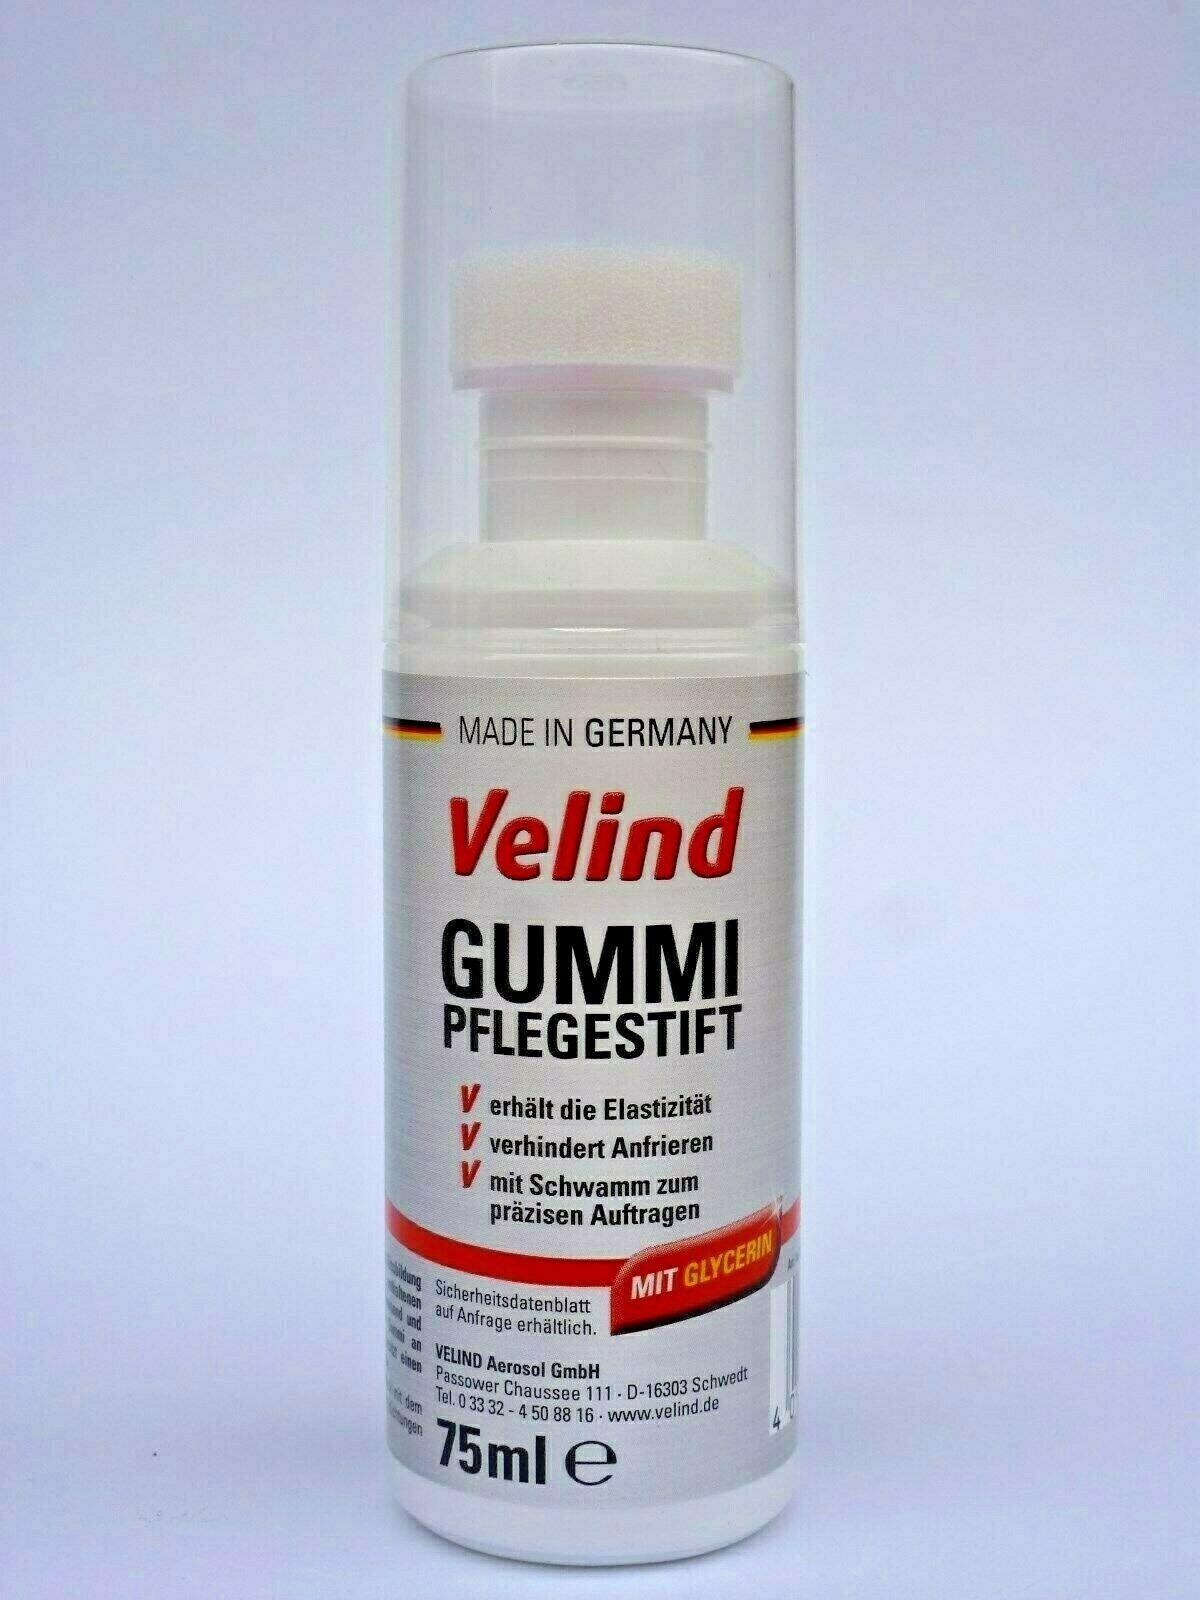 (6,47€/100ml) 1x 75ml Velind Gummipflege Stift mit Glycerin Auto Türgummi Schutz